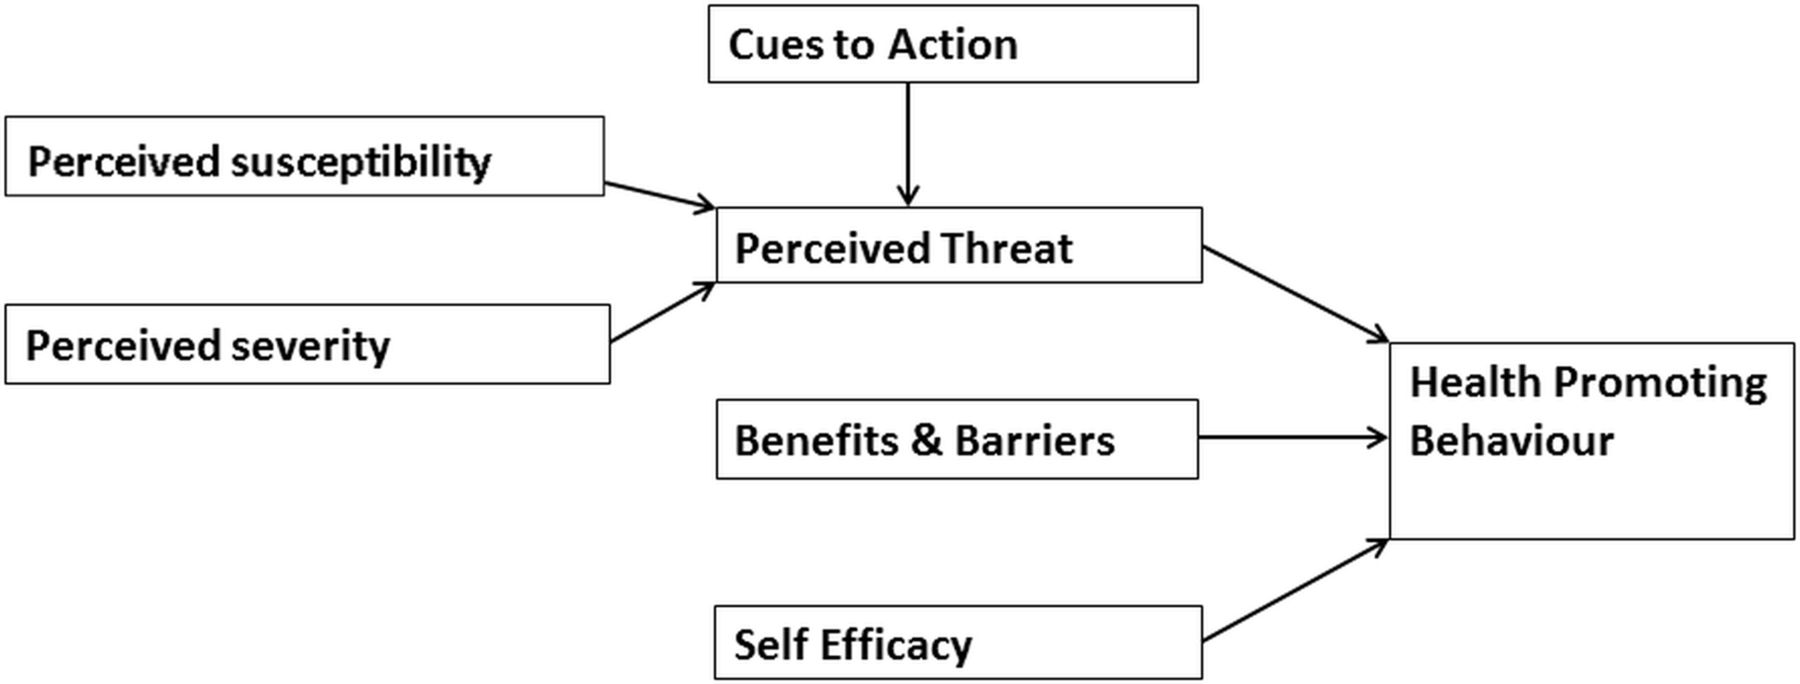 Qualitative study investigating the perceptions of parents